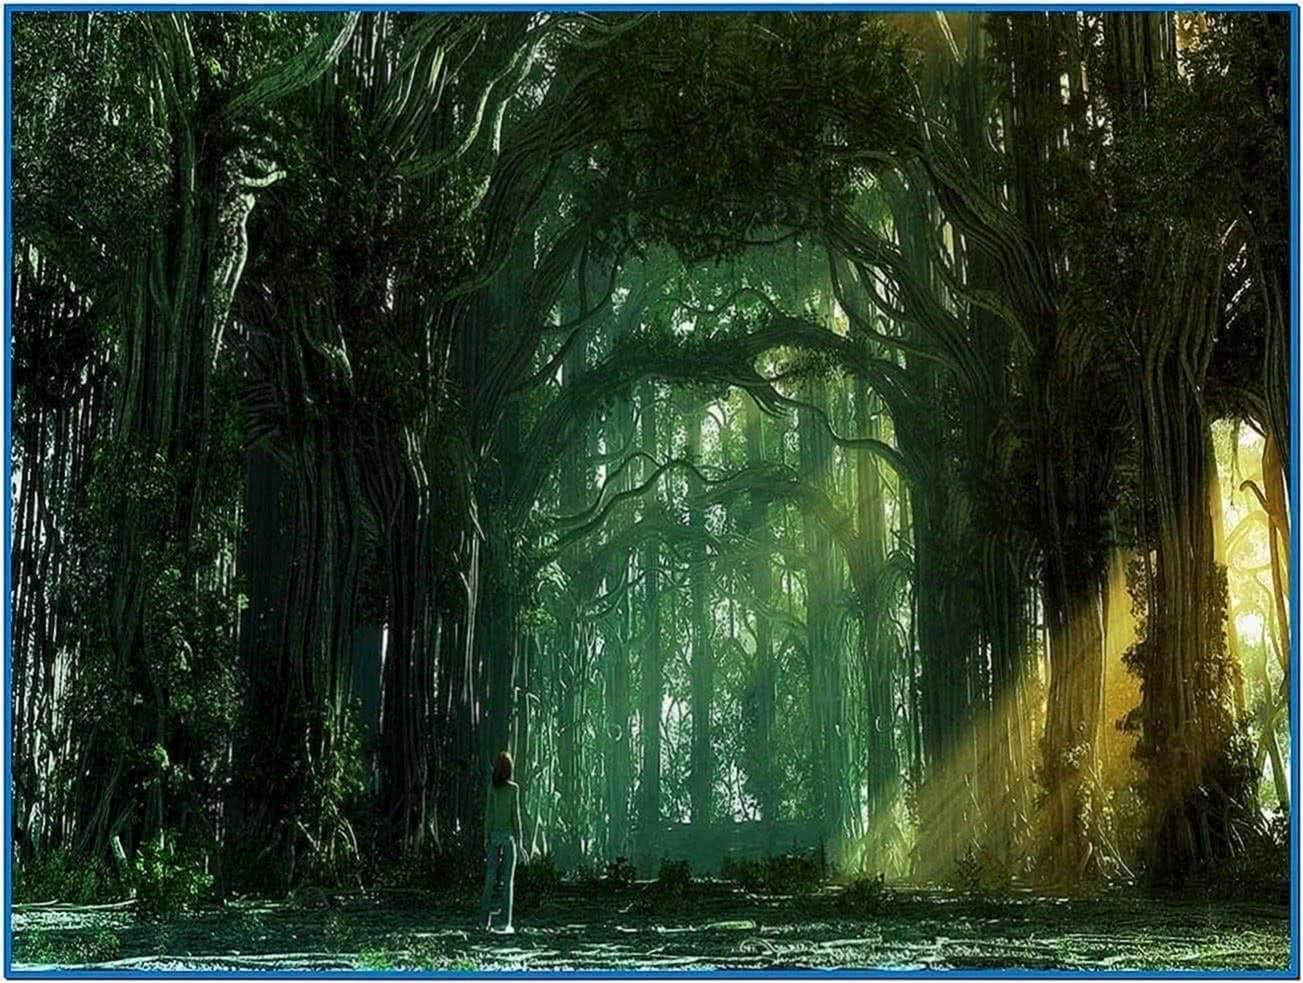 Magical forest screensaver